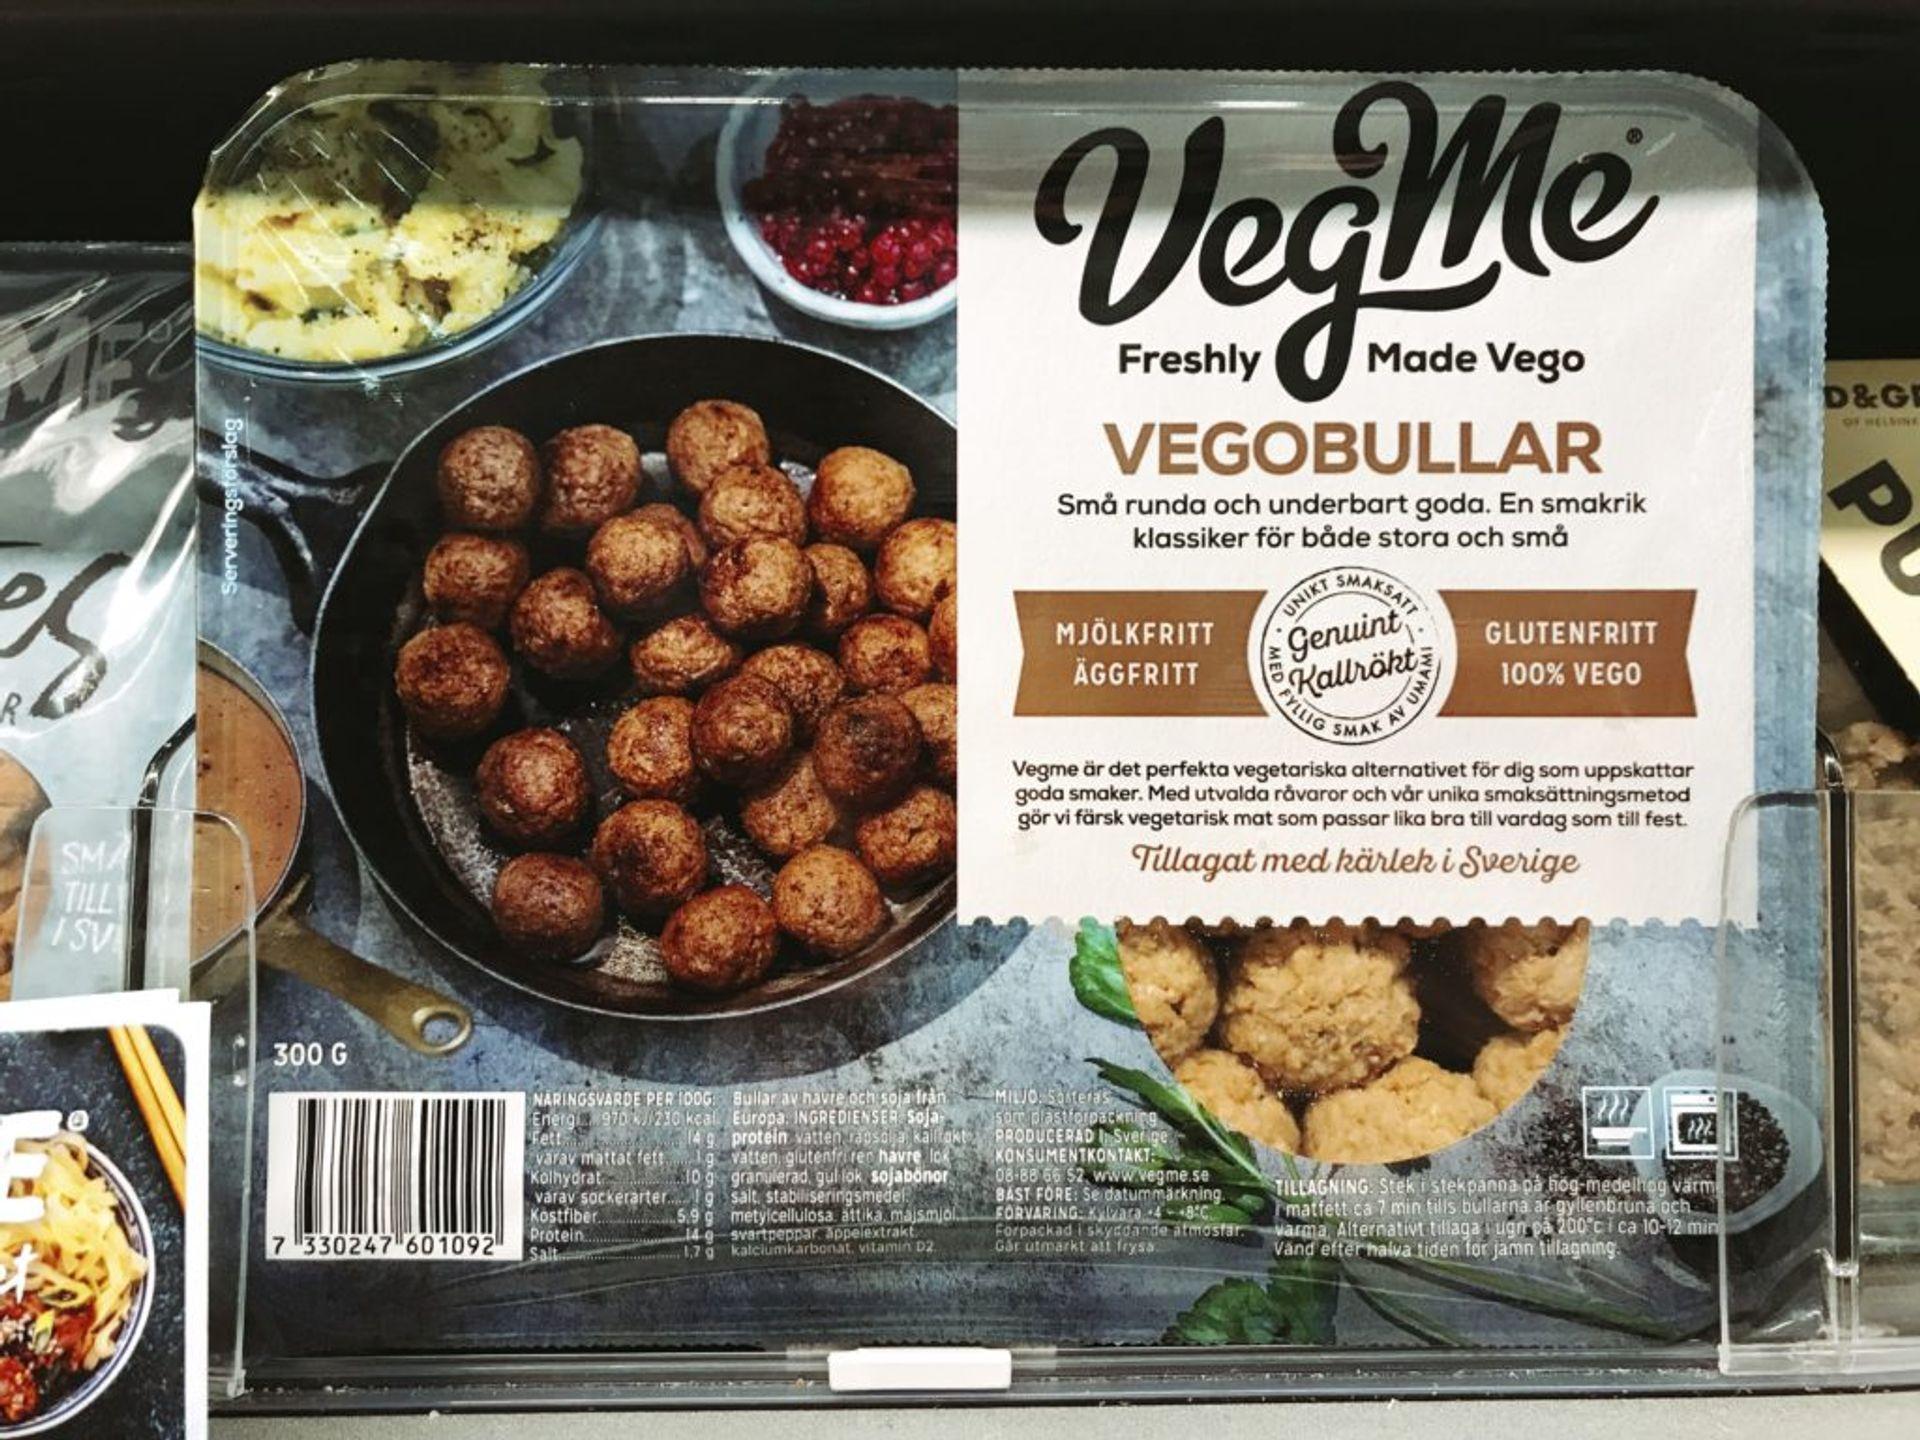 A packet of vegetarian meatballs.